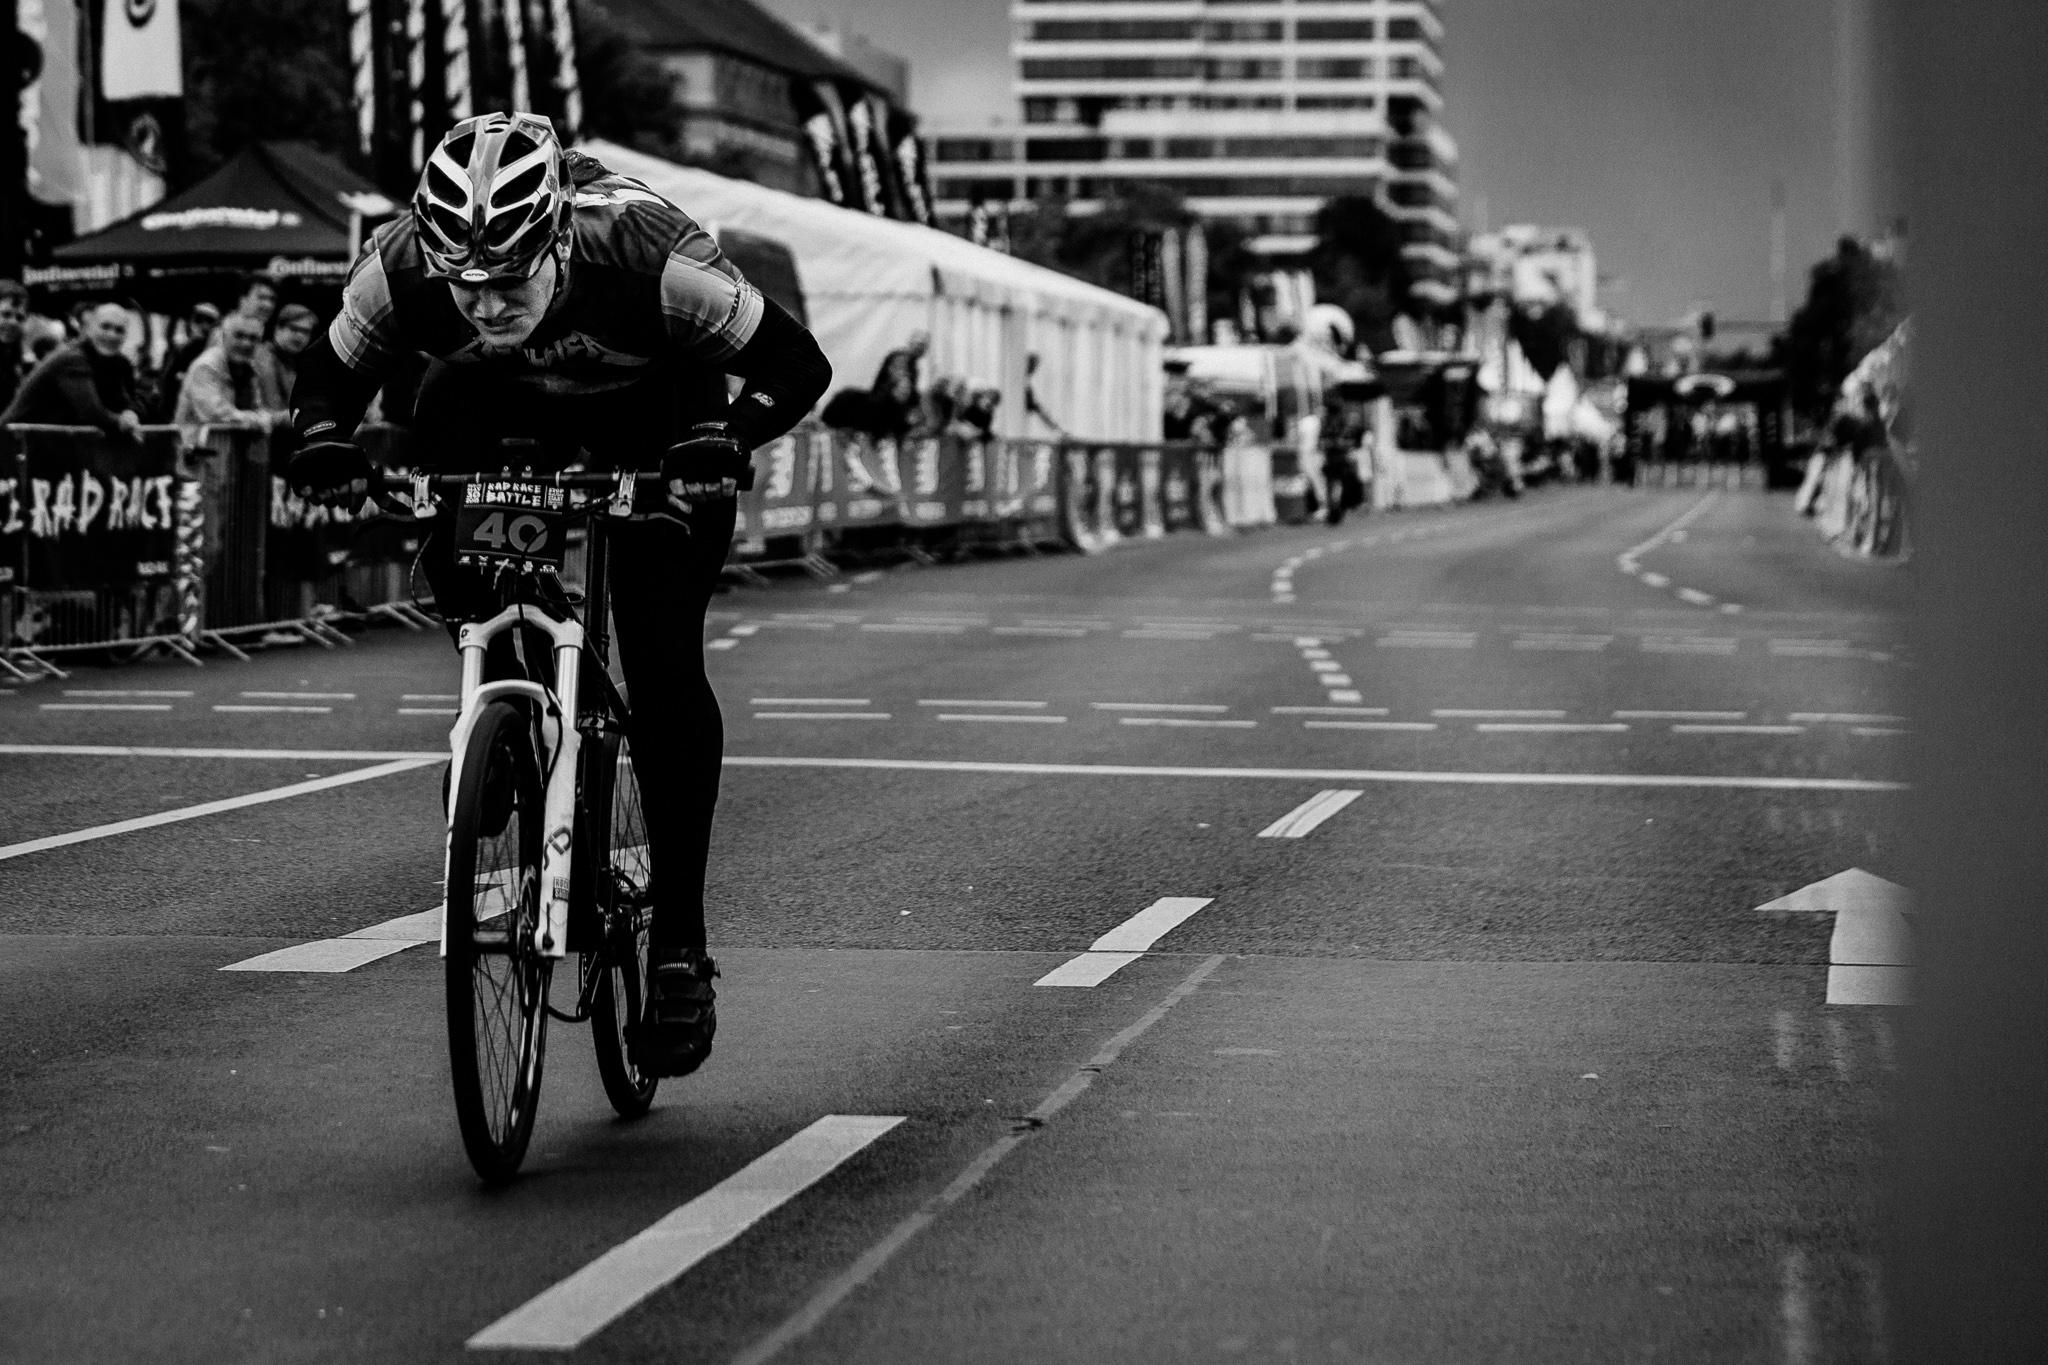 RAD RACE Battle, Berlin May 30 2015 Photo by Björn Lexius_02.jpg